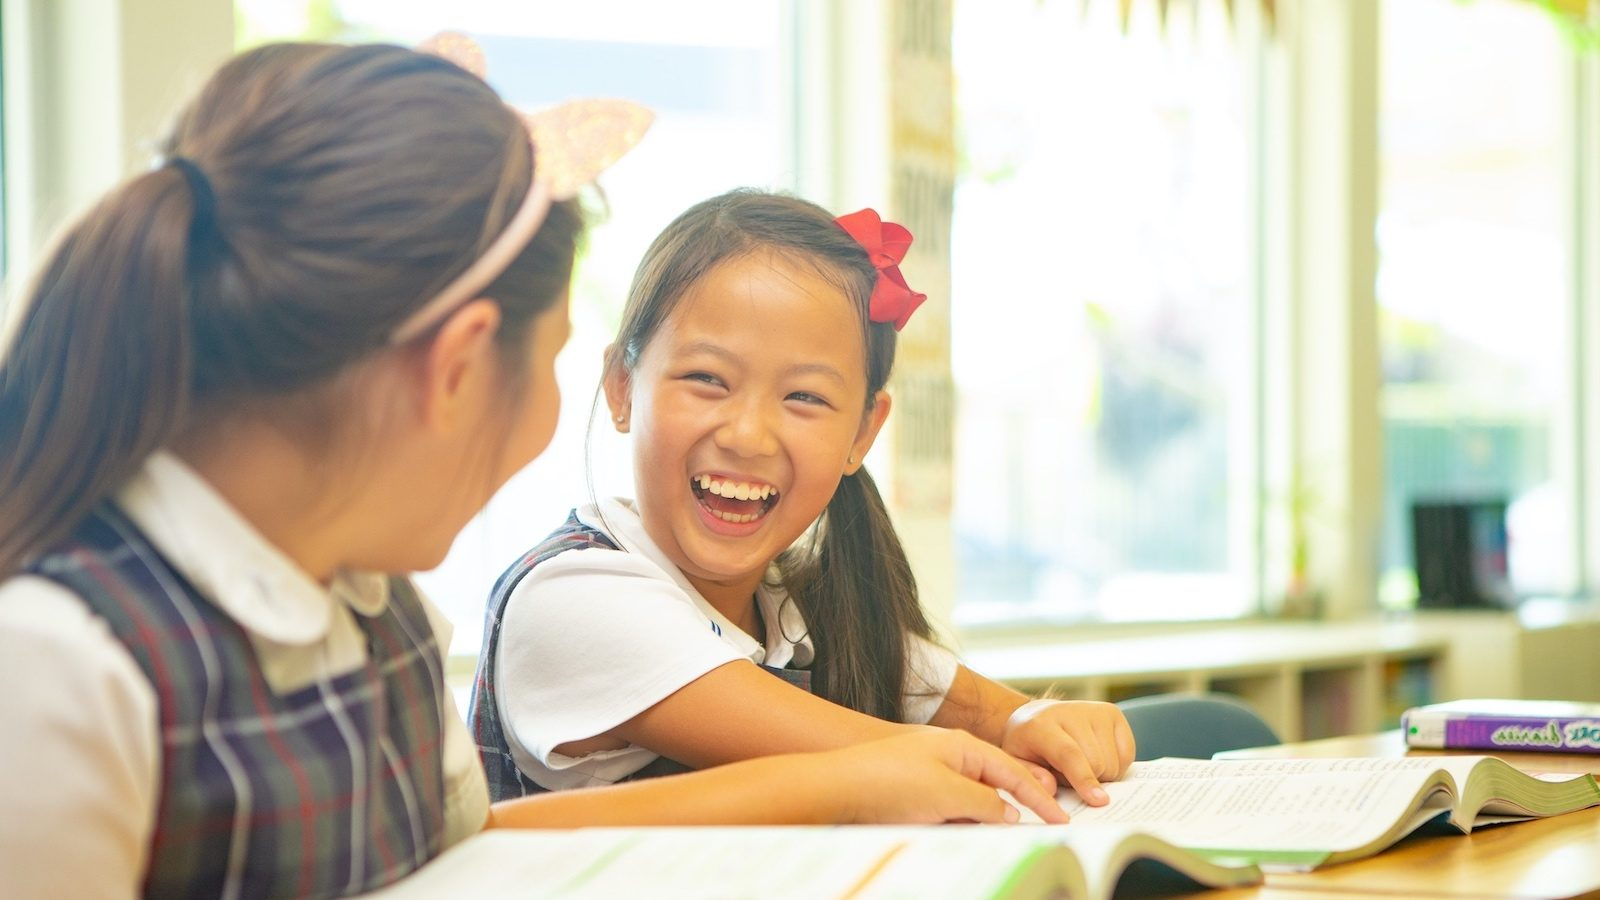 Fairmont Schools - Coronavirus Update May 22